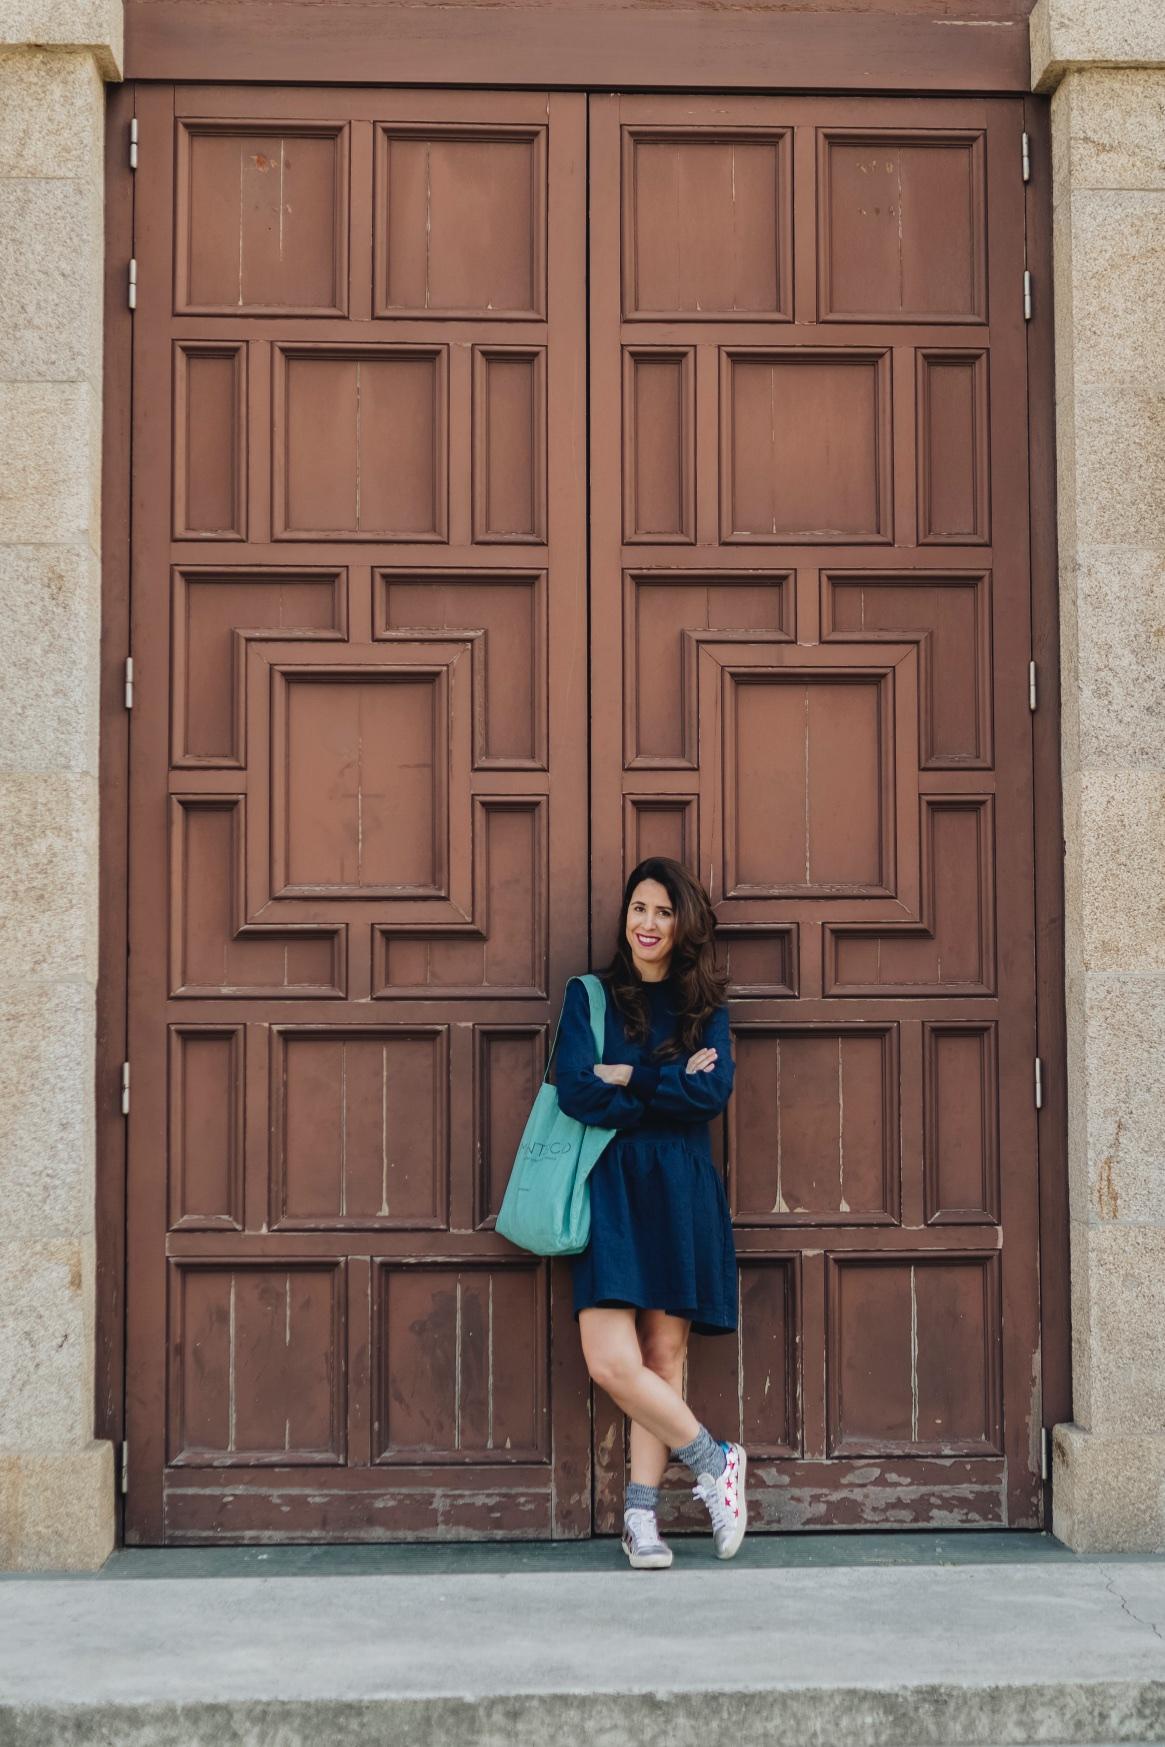 moda-vestido vaquero-zara-fashion-blogger-coruña-descalzaporelparque-Saint Laurent-sneakers